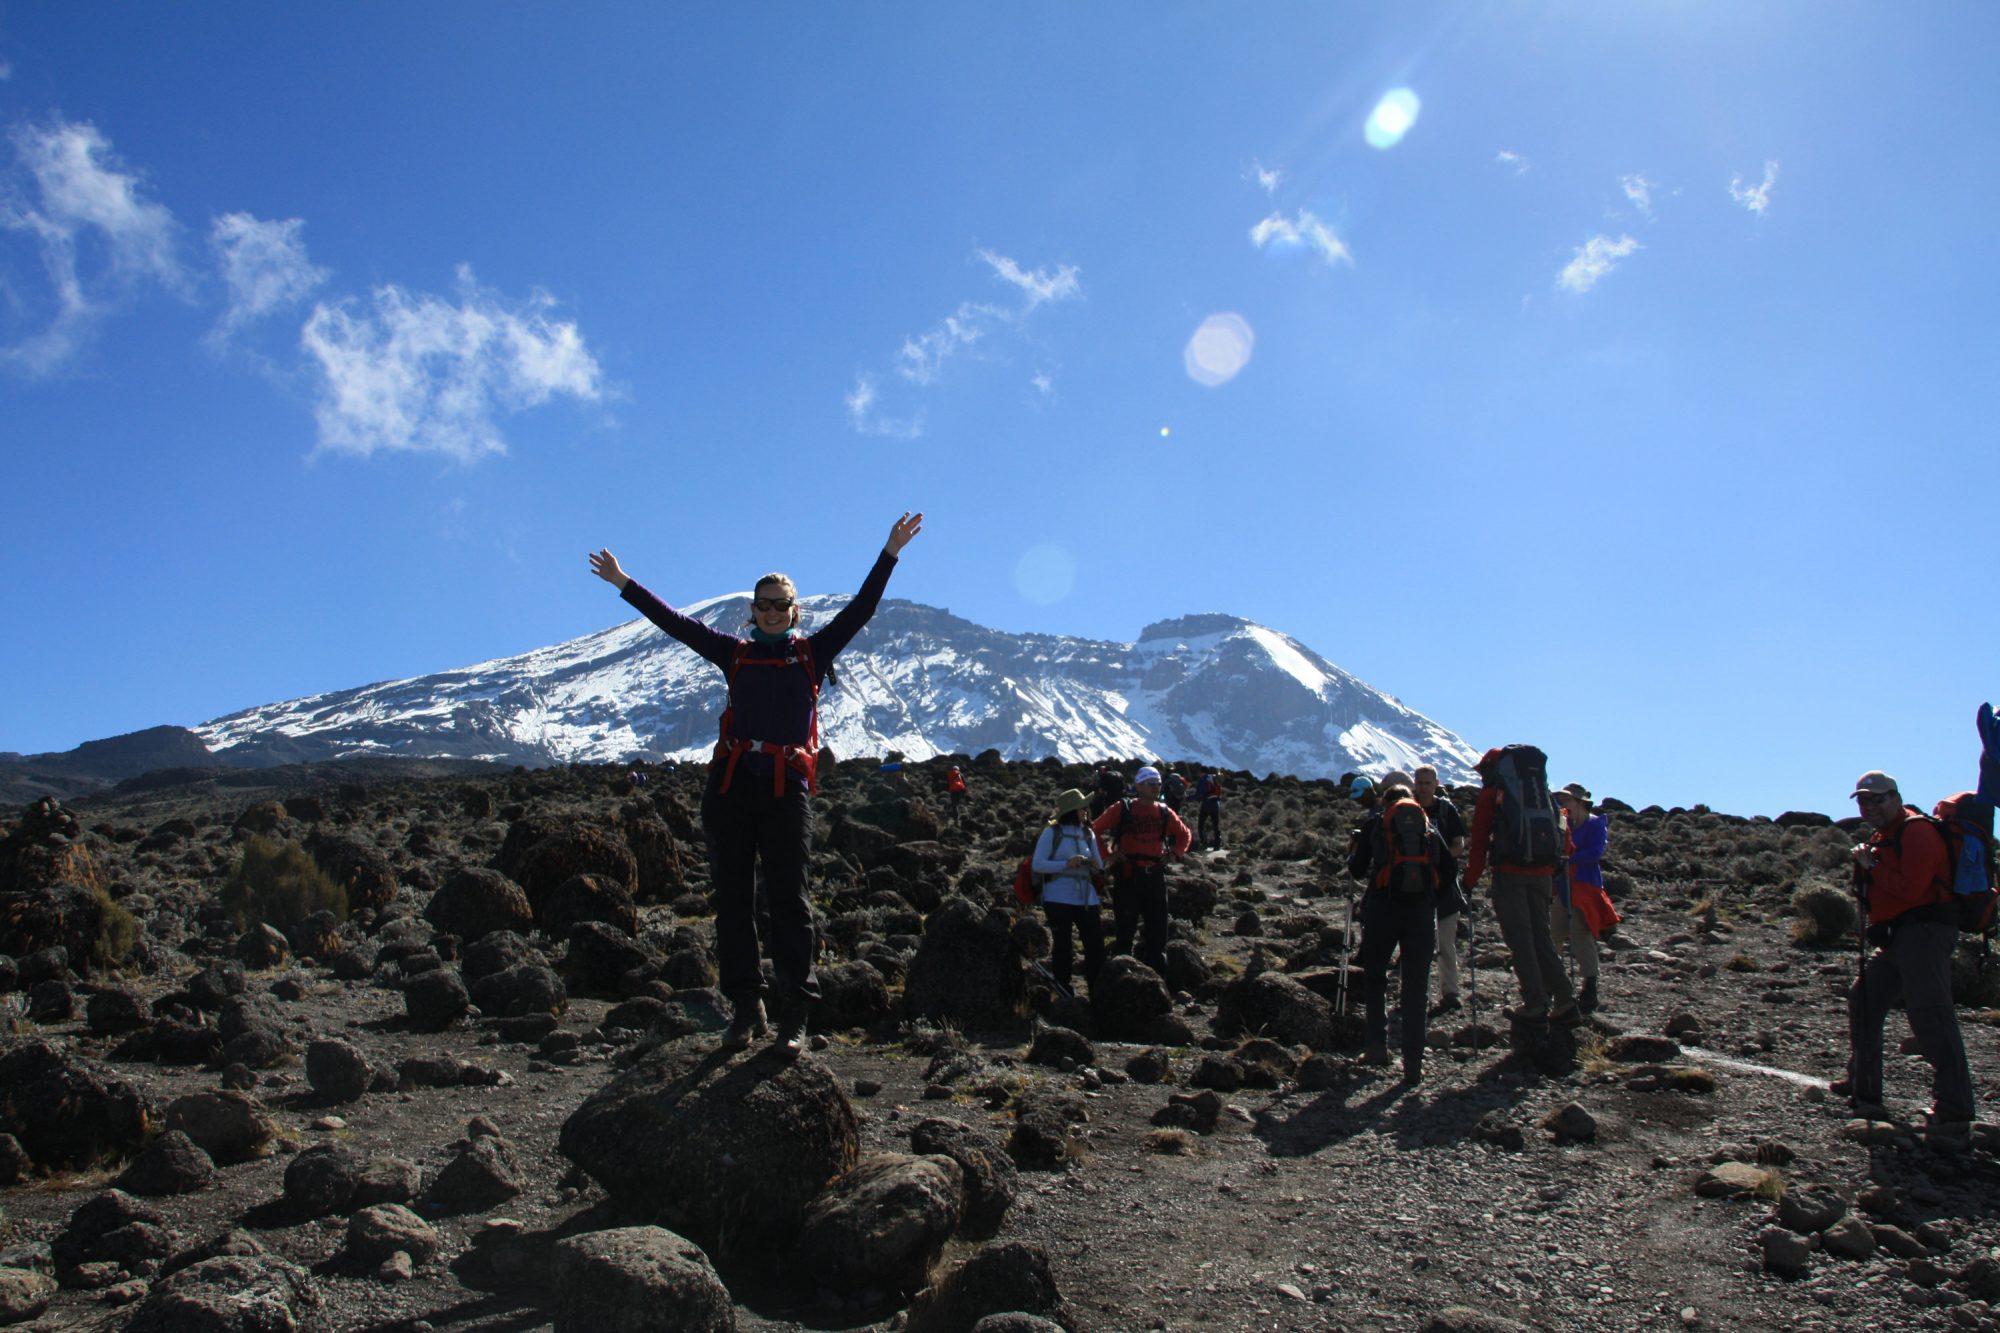 Kibo, Kilimandscharo, Kilimandscharo besteigen, Tansania, Afrika, Kilimandscharo Tour, Erfahrungsbericht, Machame Route